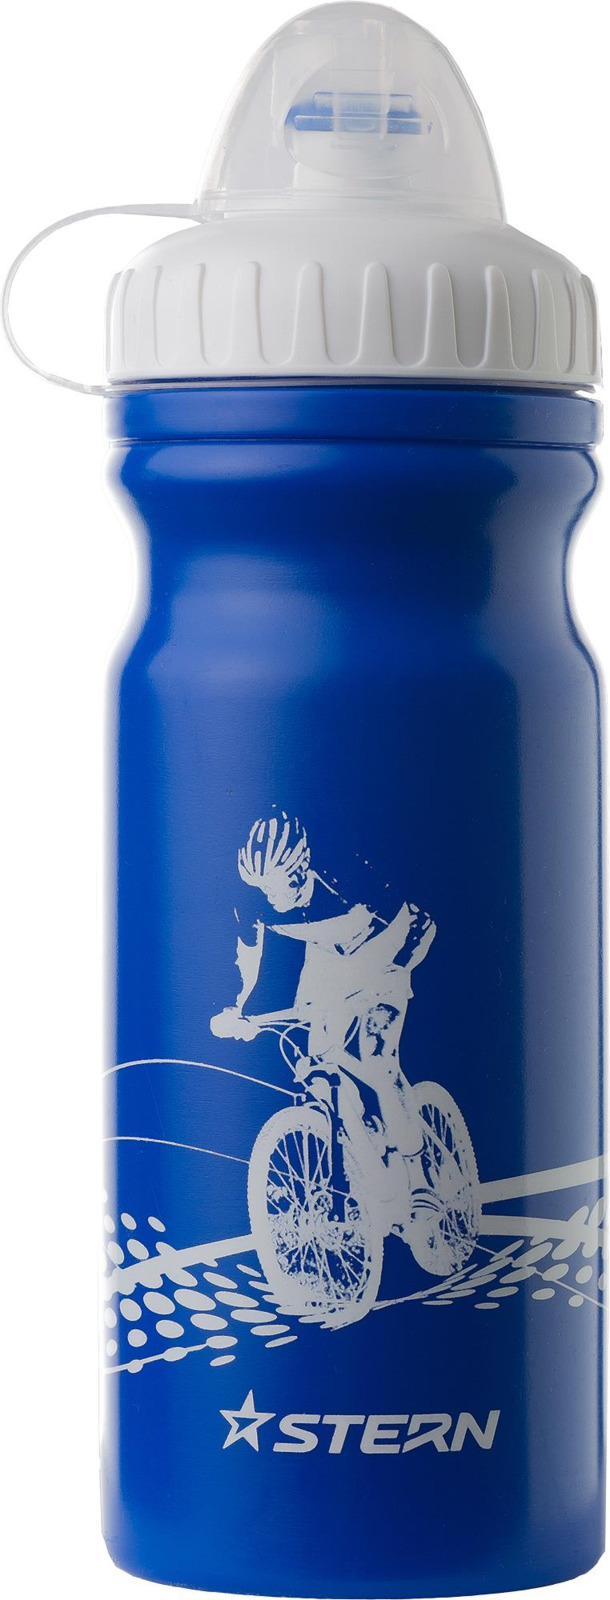 Фляга велосипедная Stern 01 CBOT-1 Water bottle, синий